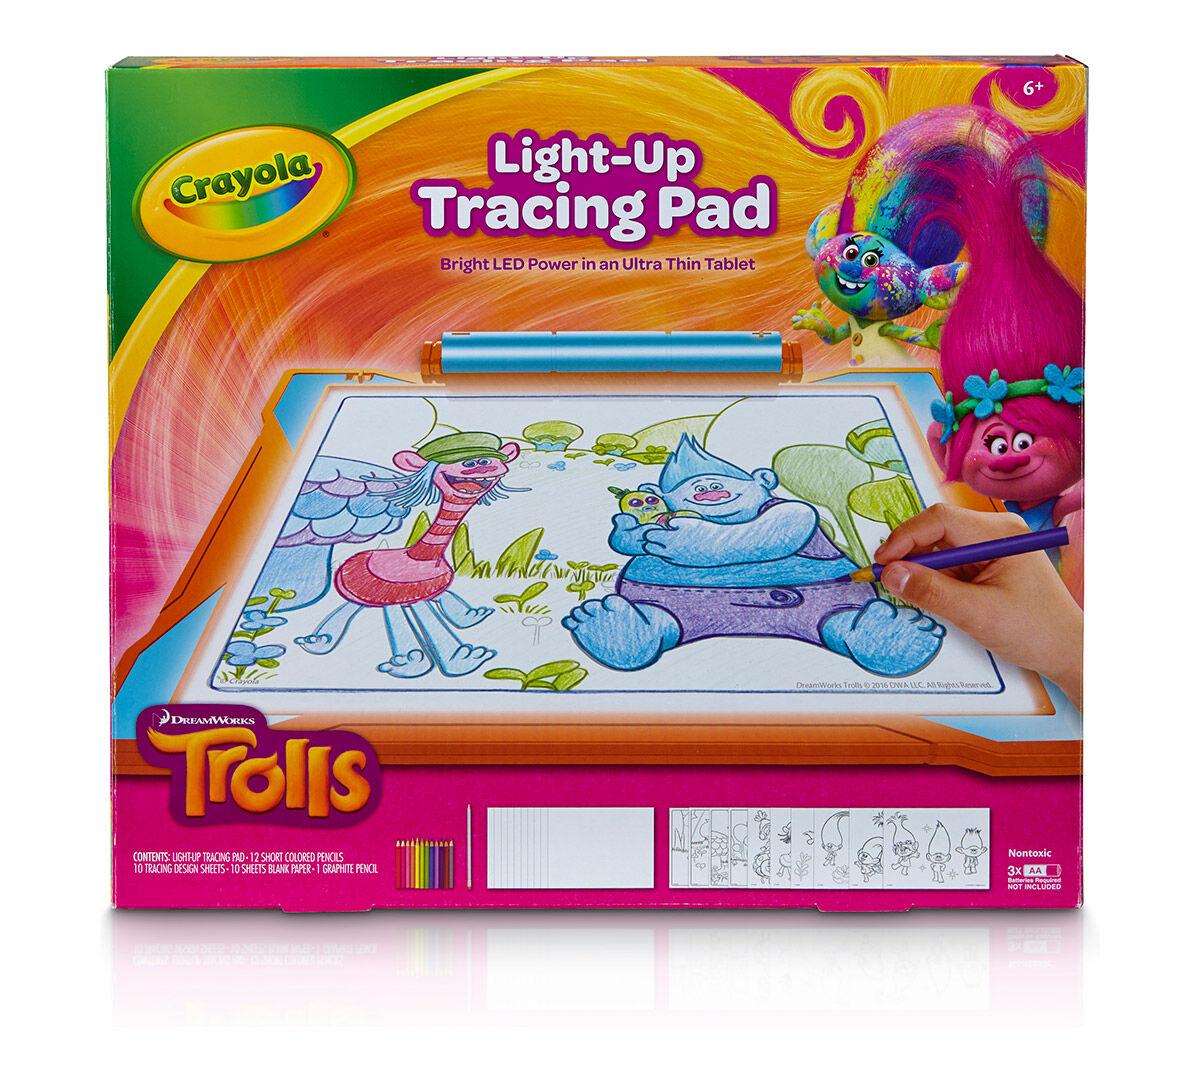 Crayola Trolls Light Up Tracing Pad 04 6927 Ebay